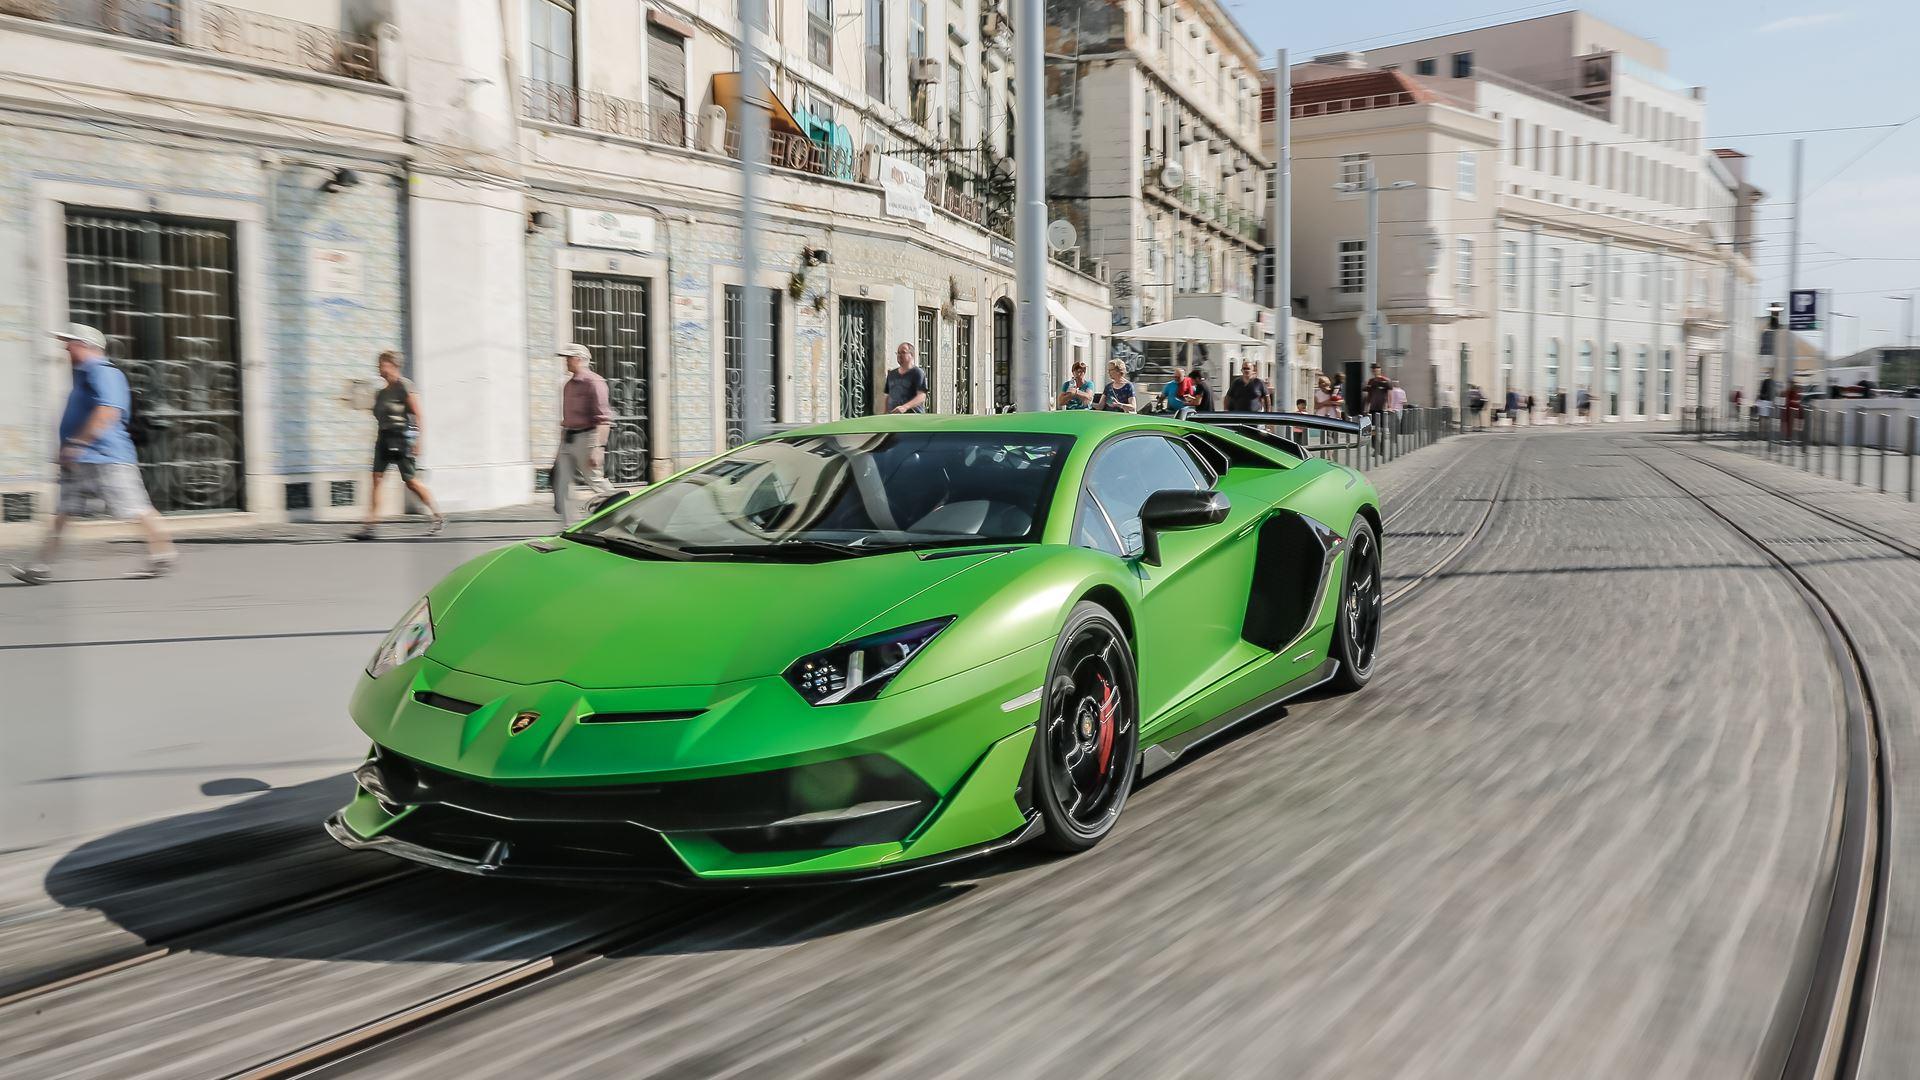 Lamborghini V12 at 60° - The flagship Lamborghini engine: performance and emotion - Image 6